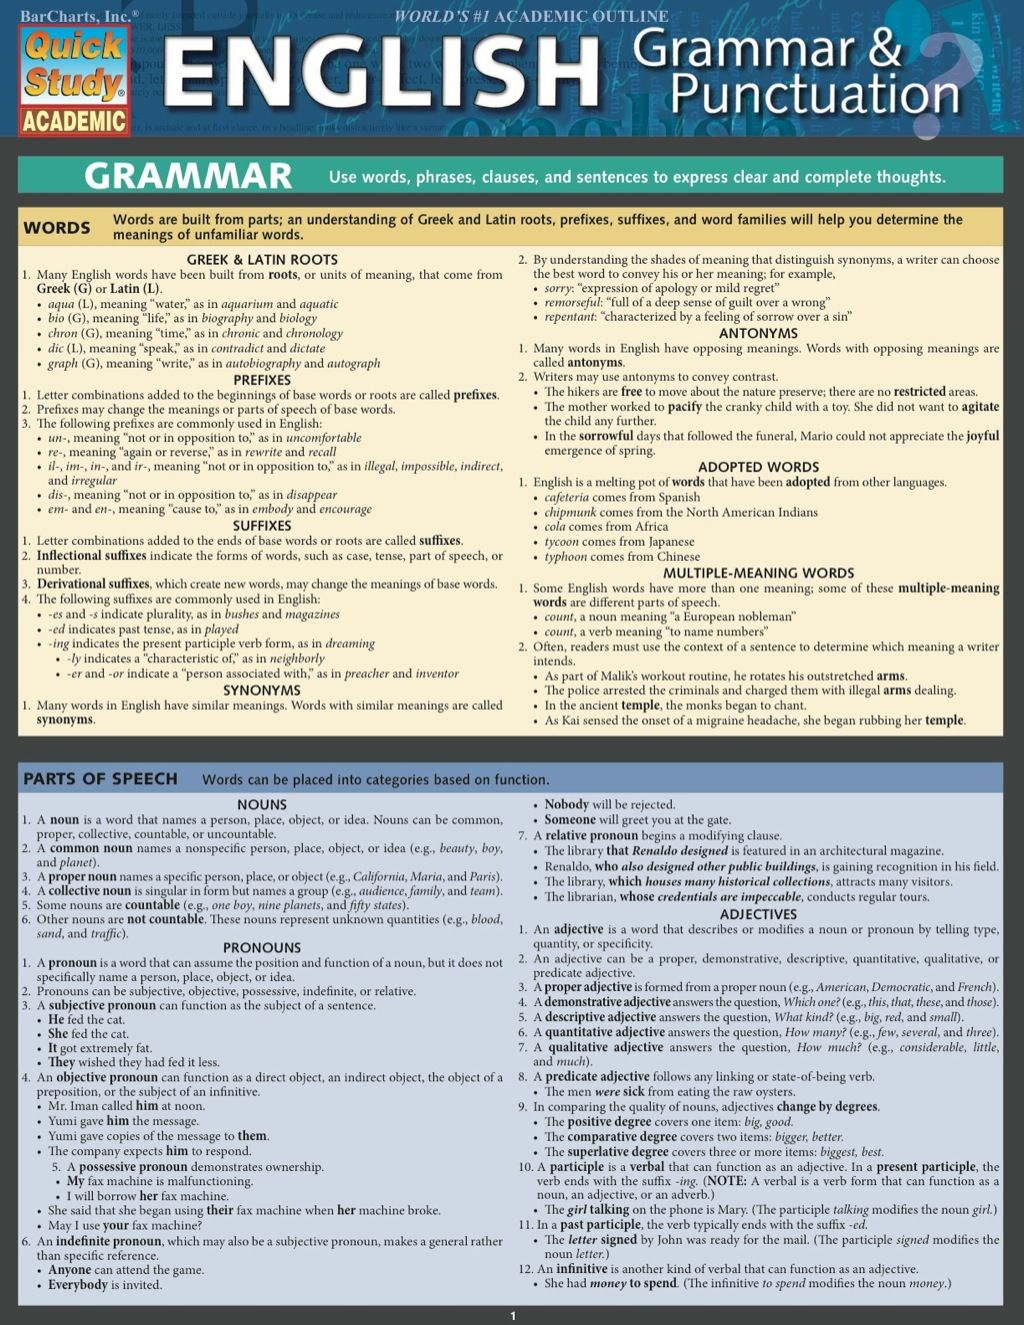 English Grammar Punctuation Study Guide Ebook Rental English